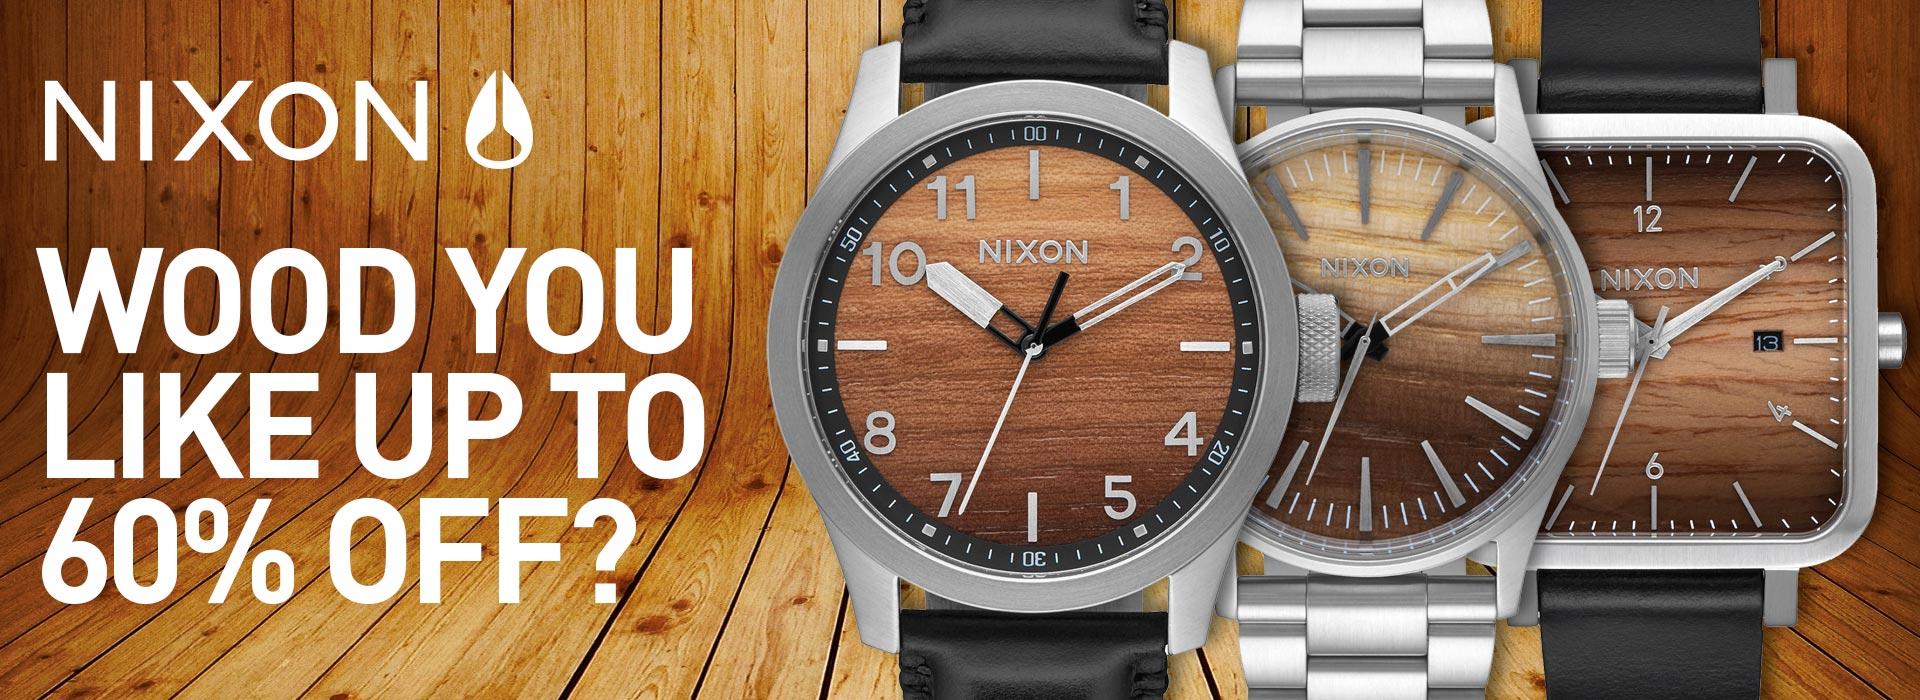 nixon watches on sale